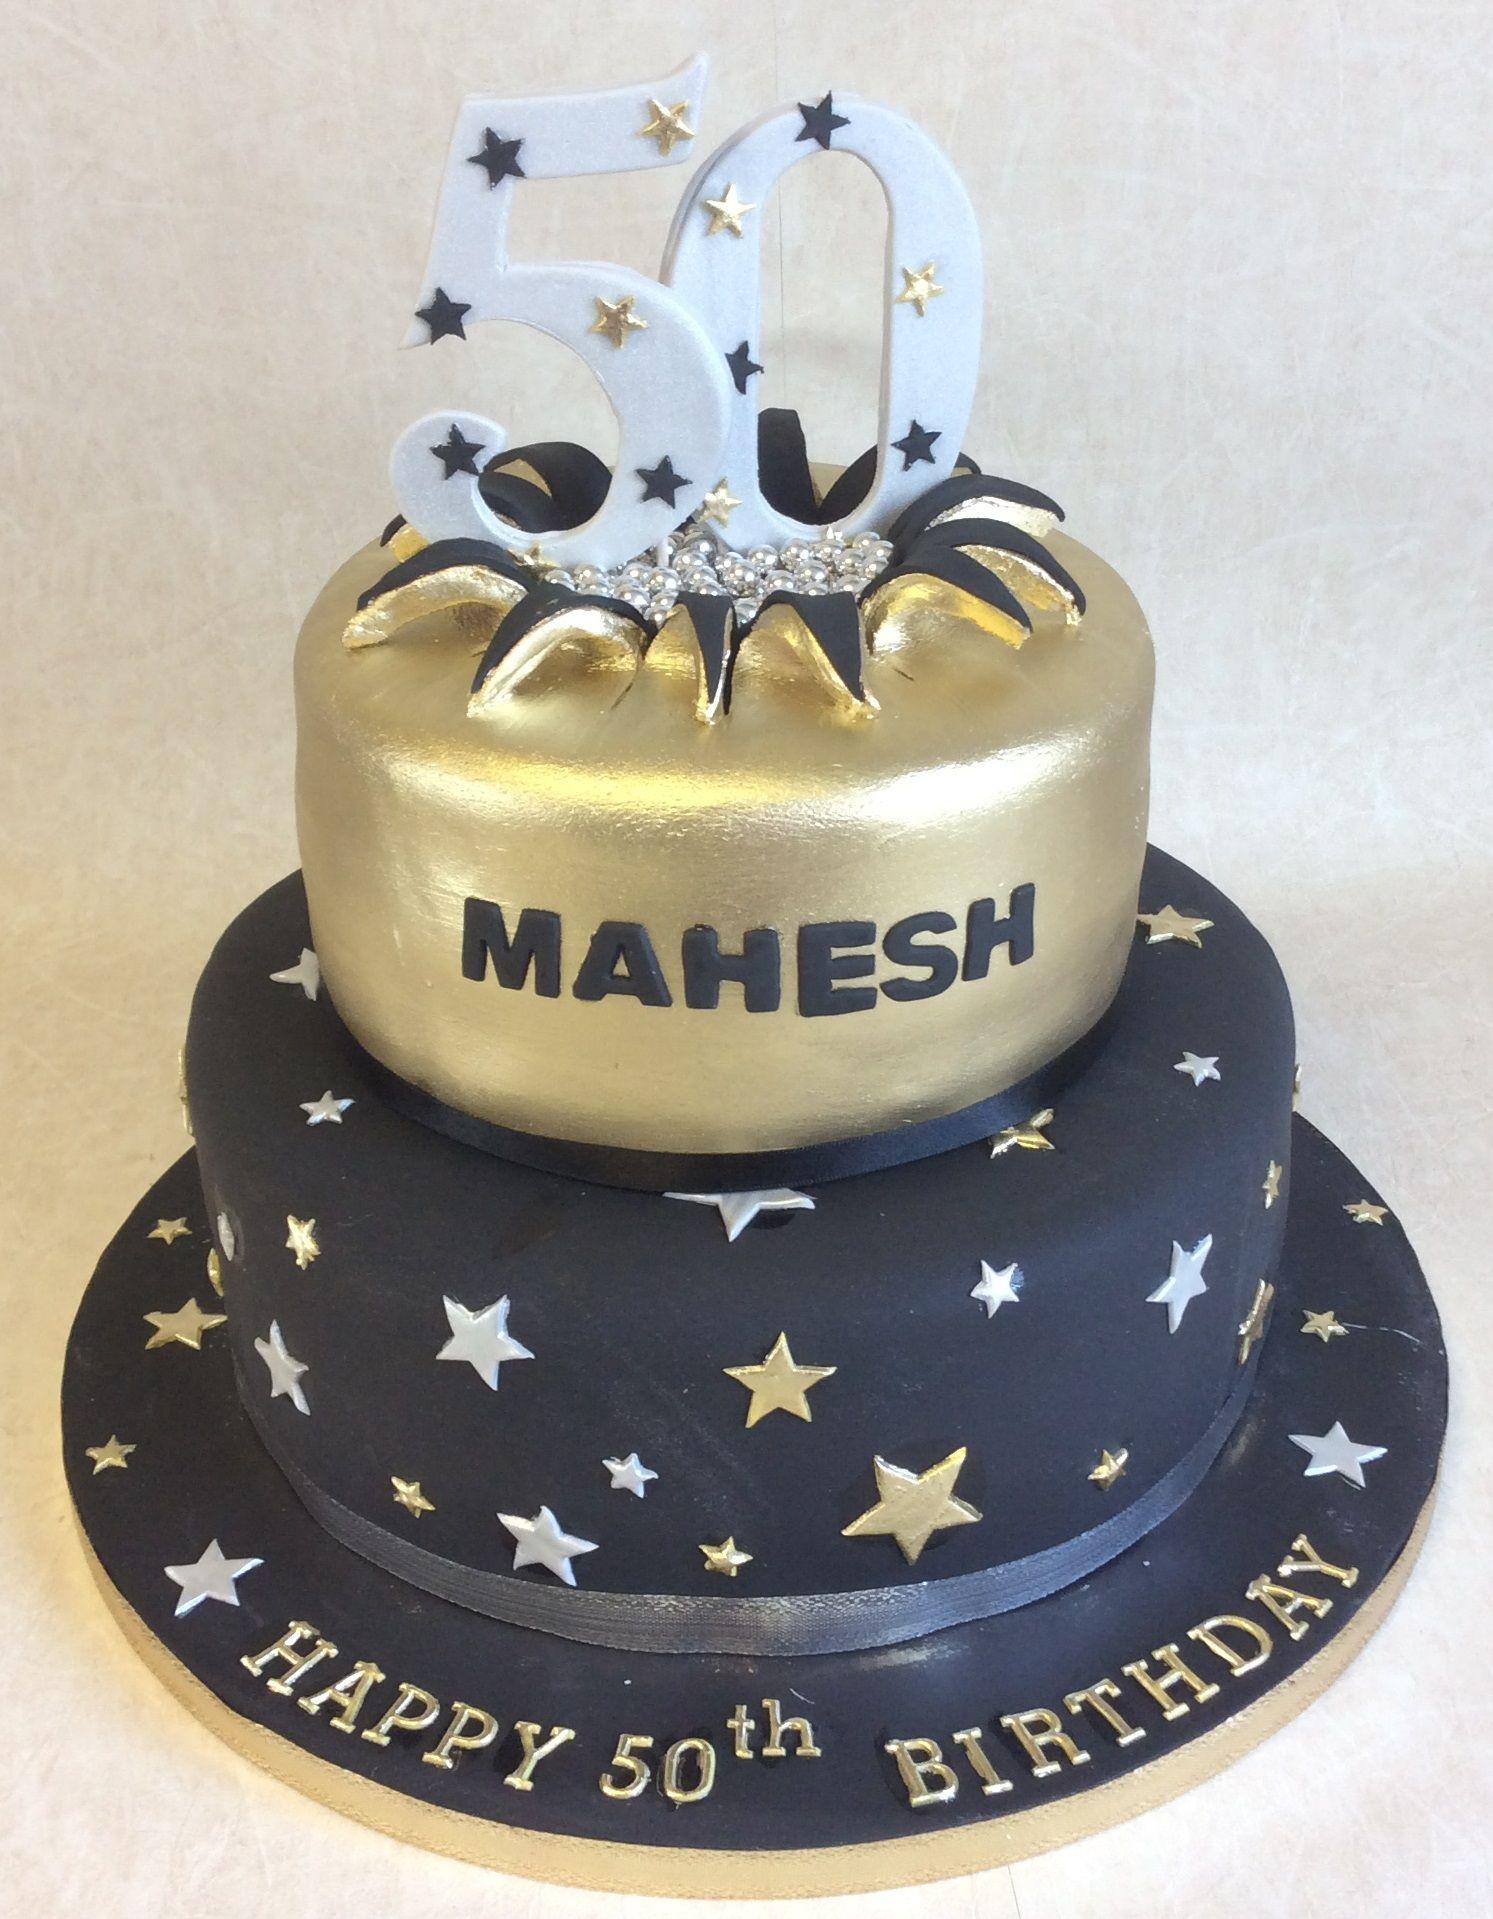 2 Tier Black Gold Birthday Cake